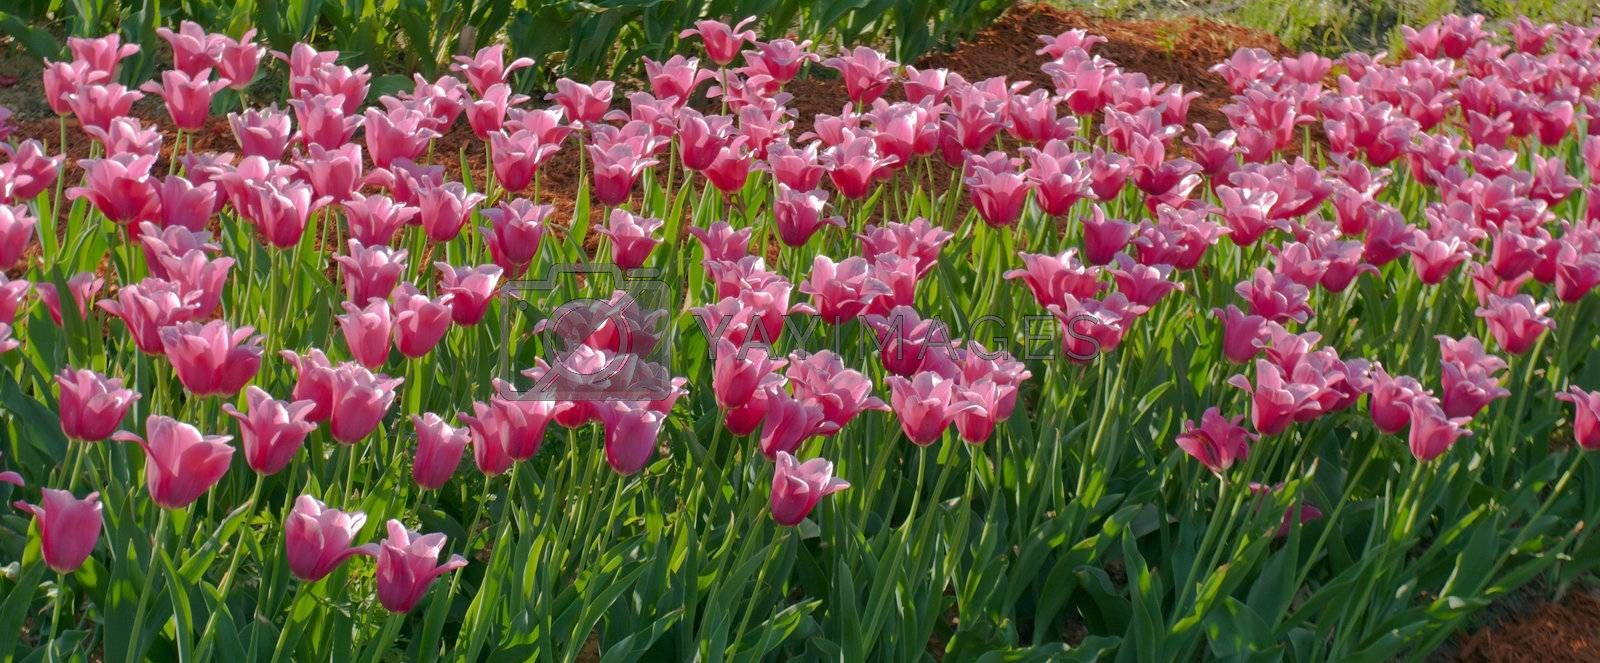 purple tulips spring flower bed